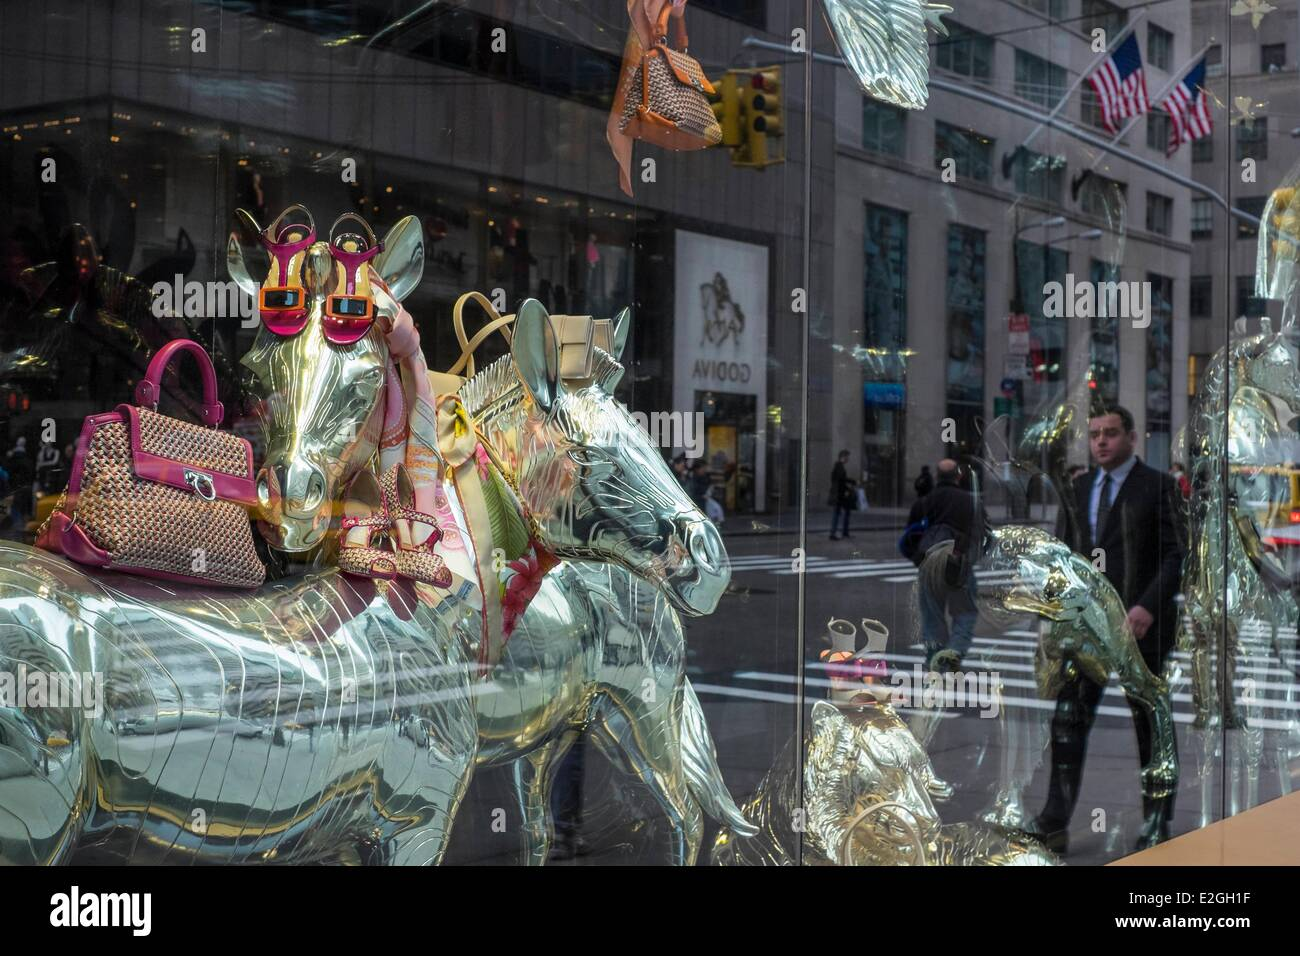 United States New York Manhattan Midtown Salvatore Ferragamo store on 5th avenue - Stock Image